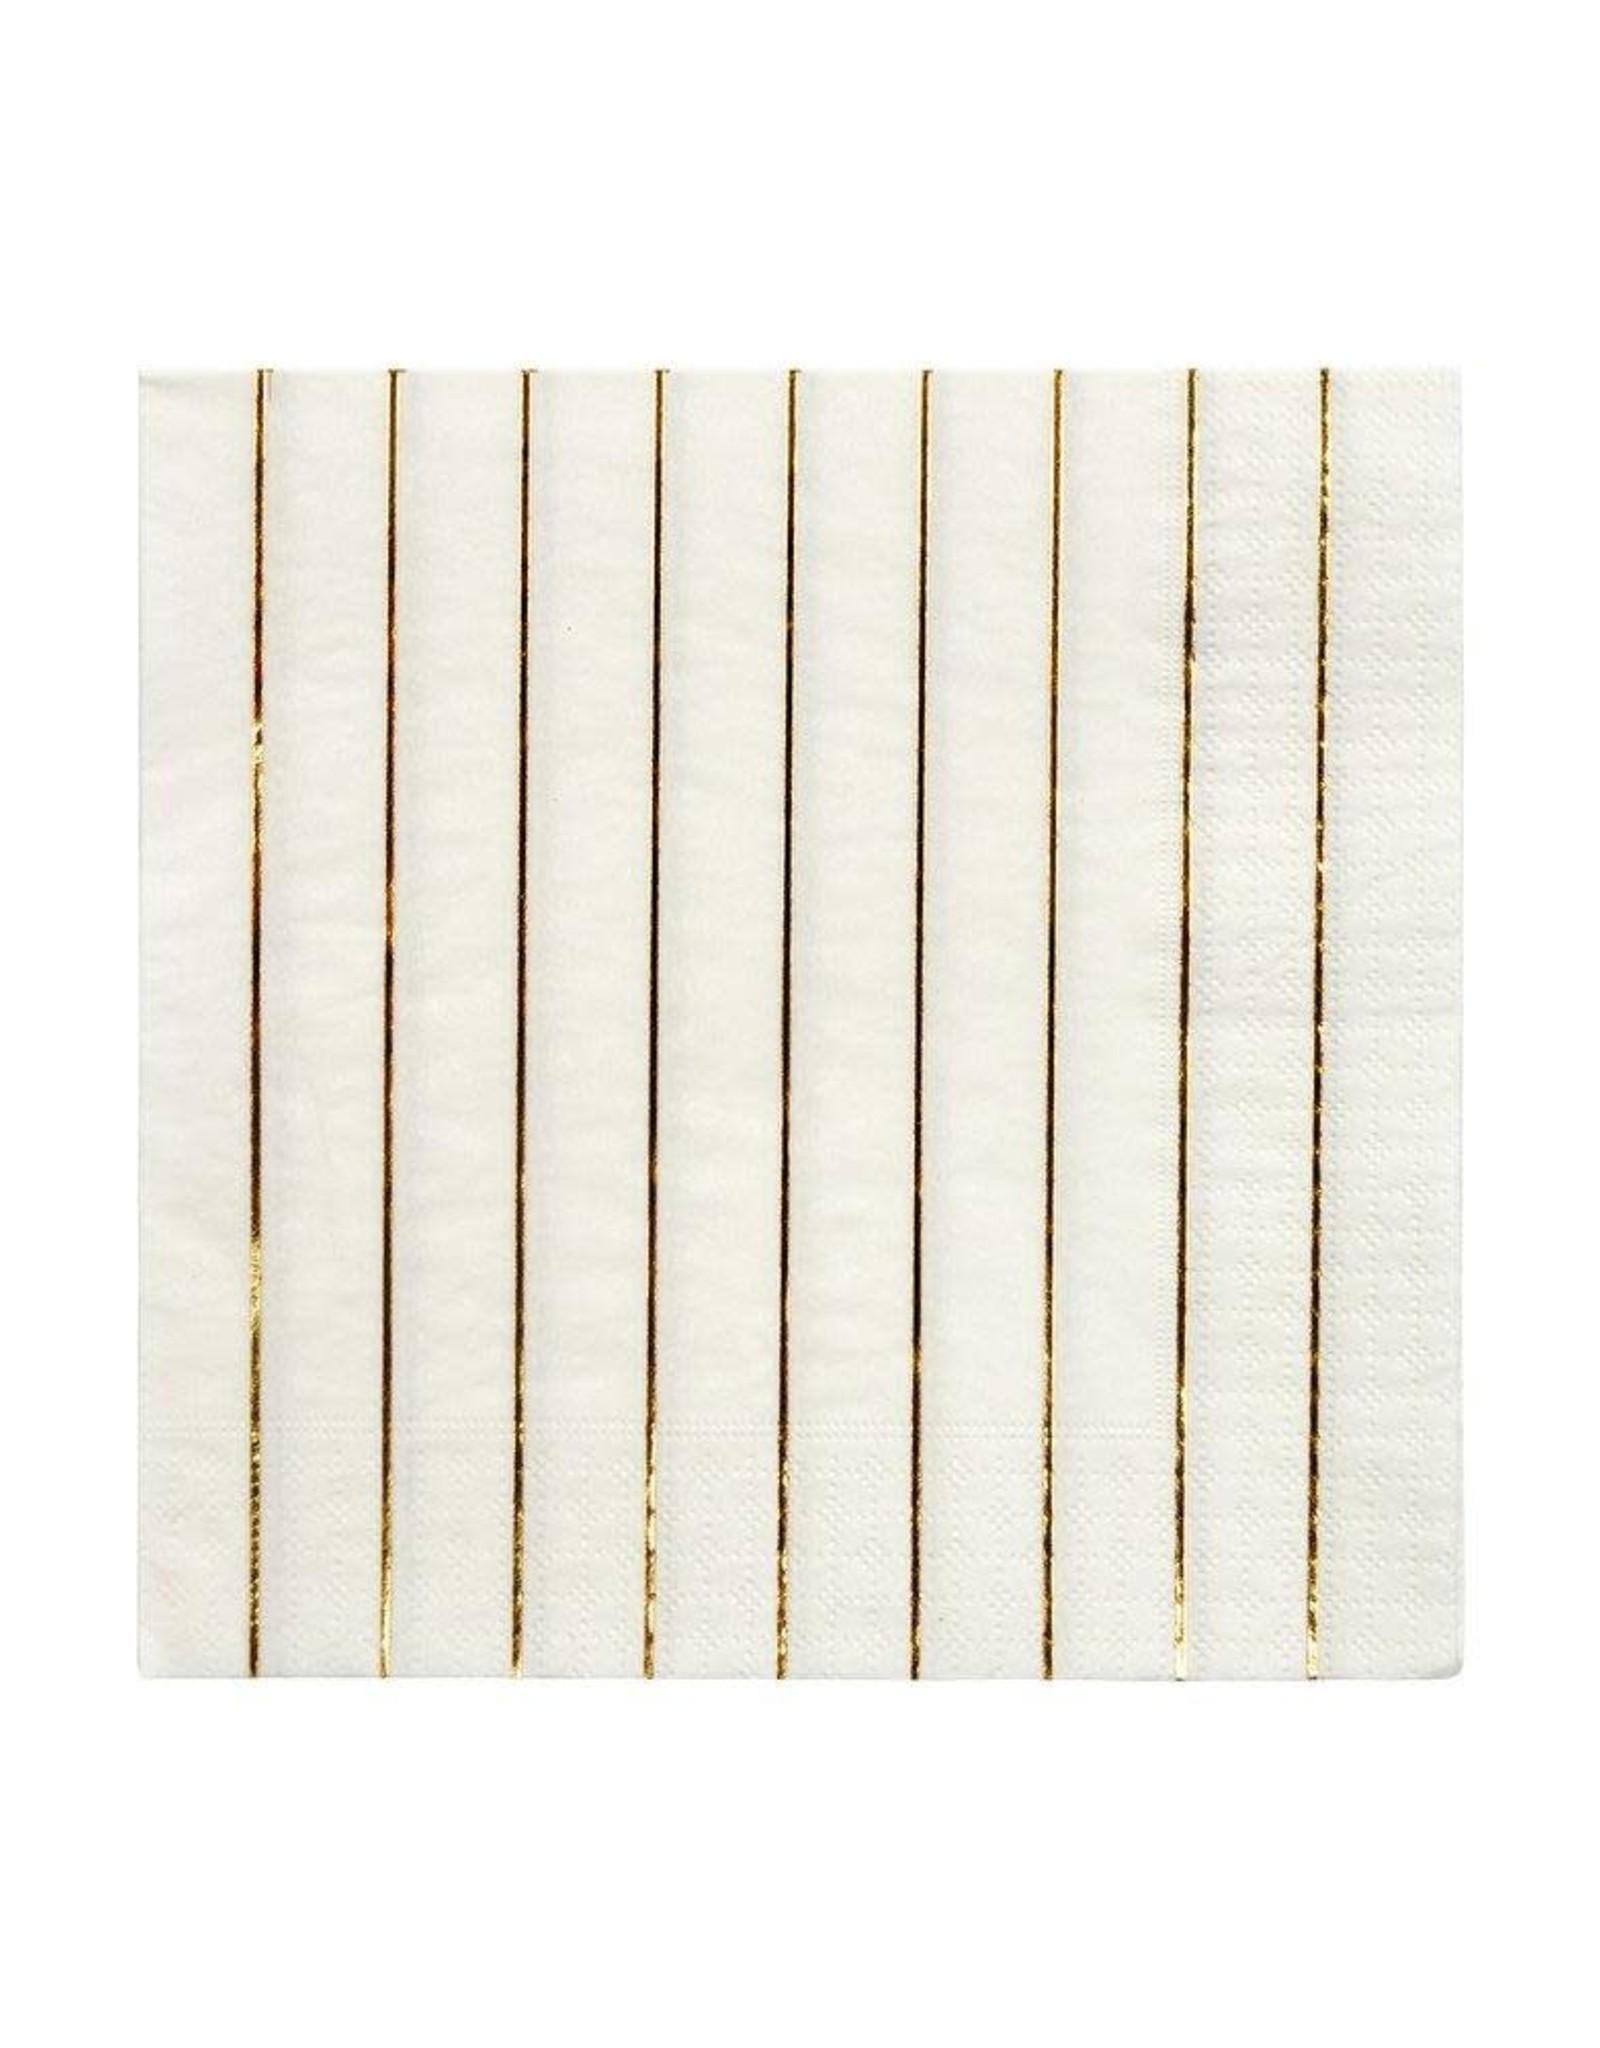 Meri Meri Meri Meri   Gold Stripe Large Napkins (set of 16)